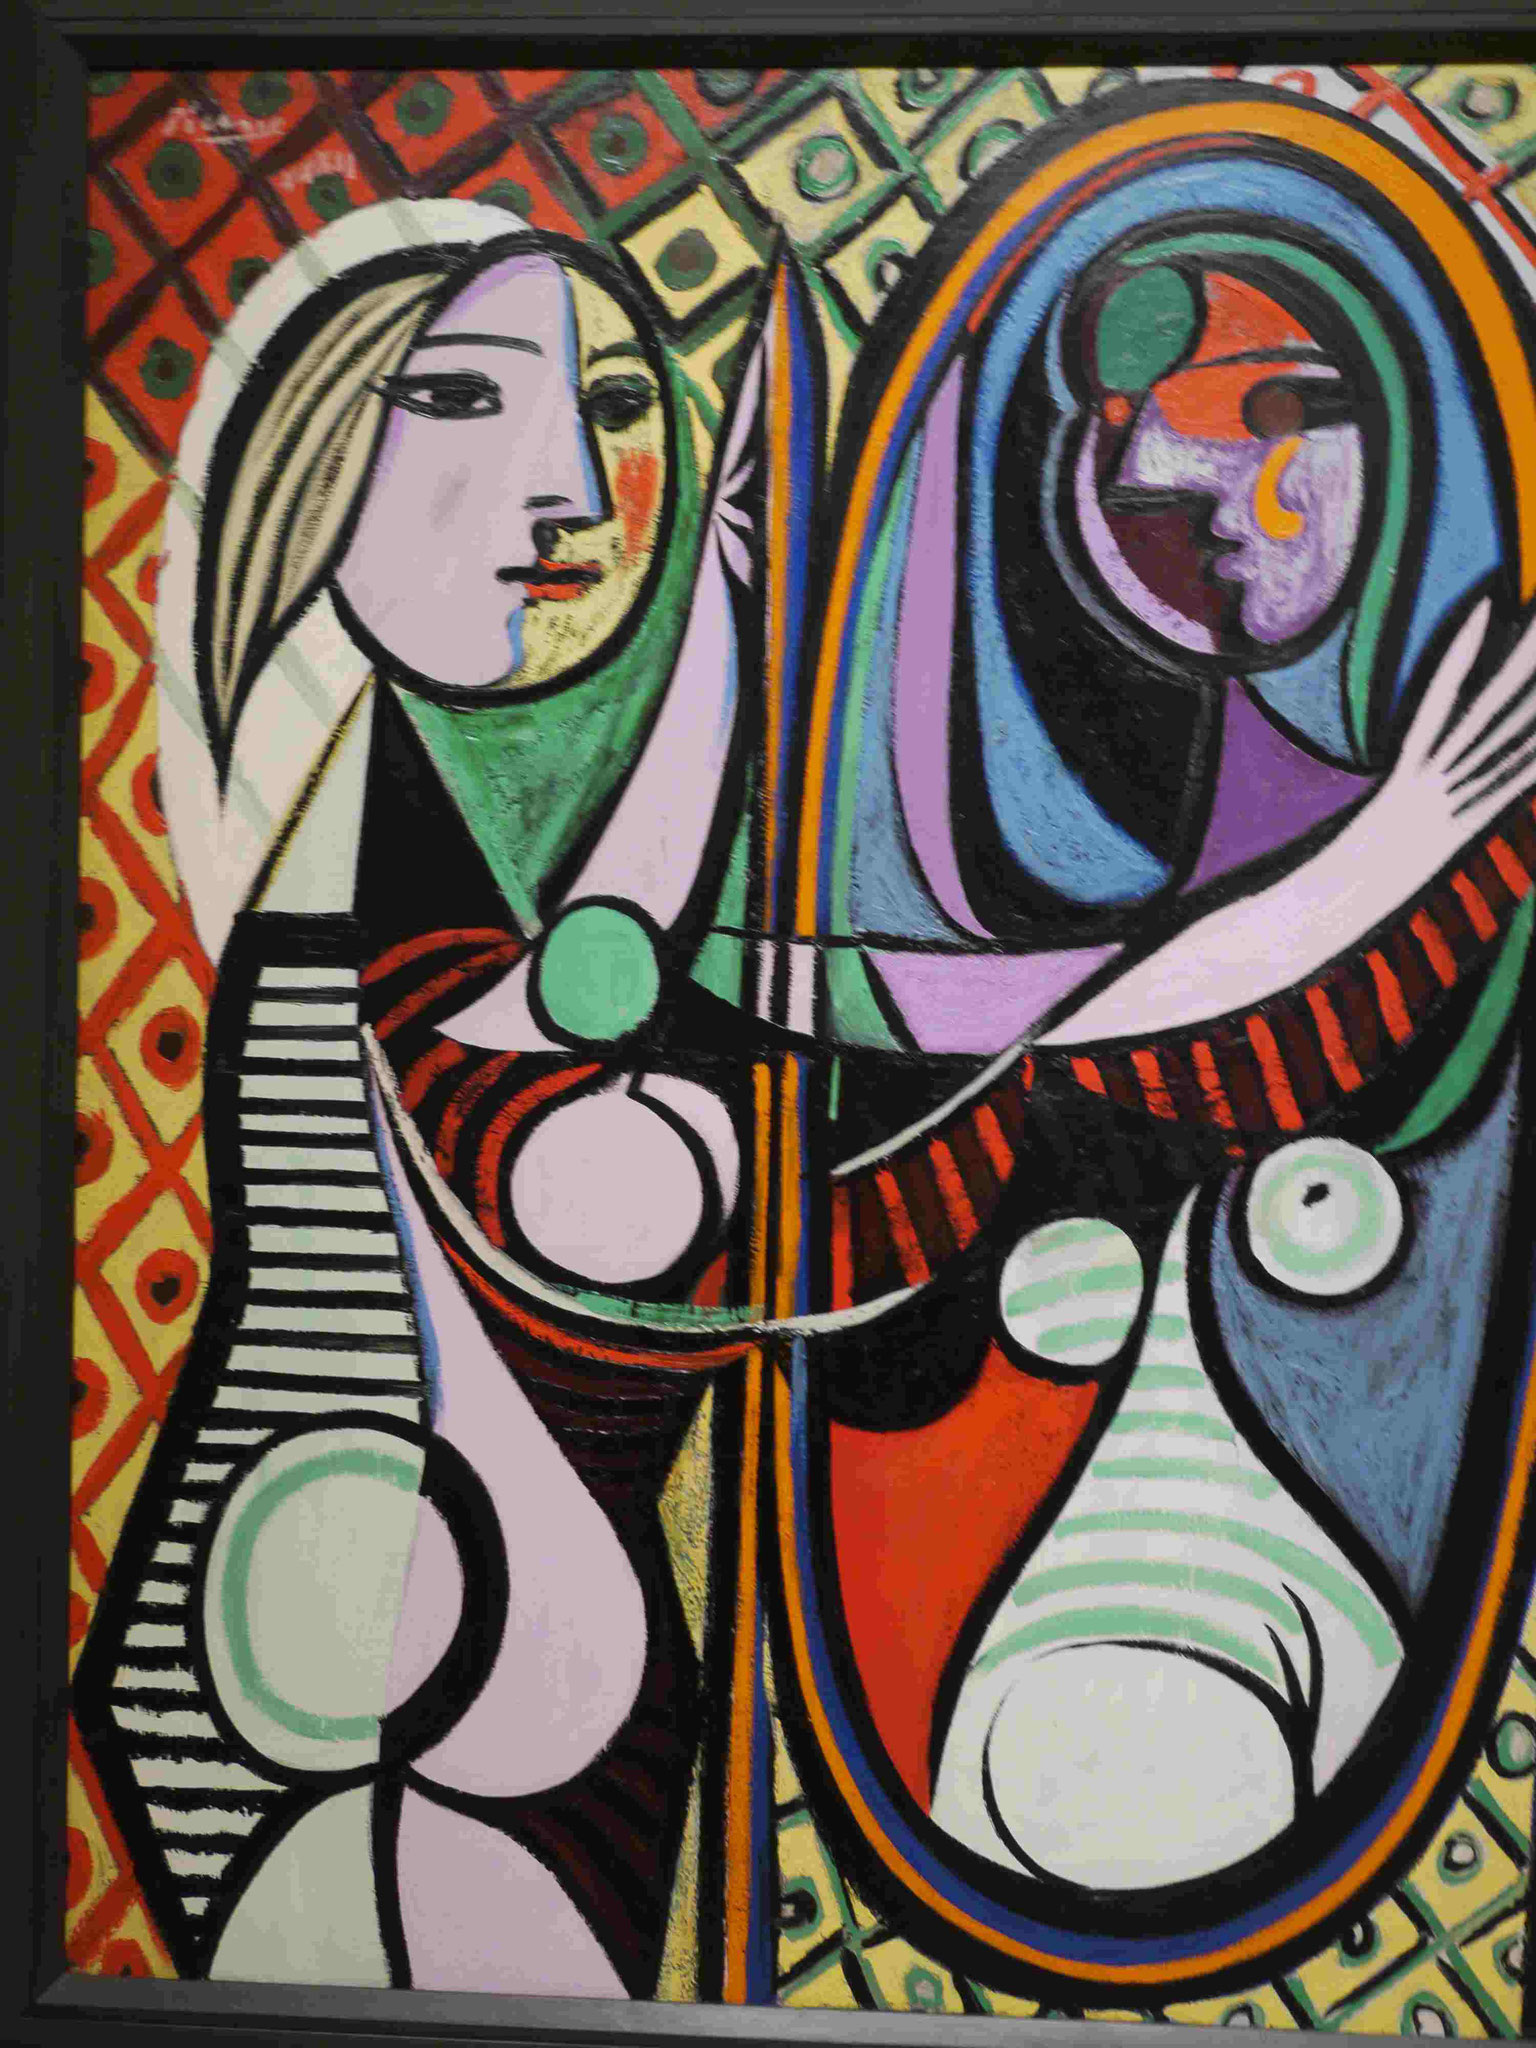 Pablo Picasso, MOMA